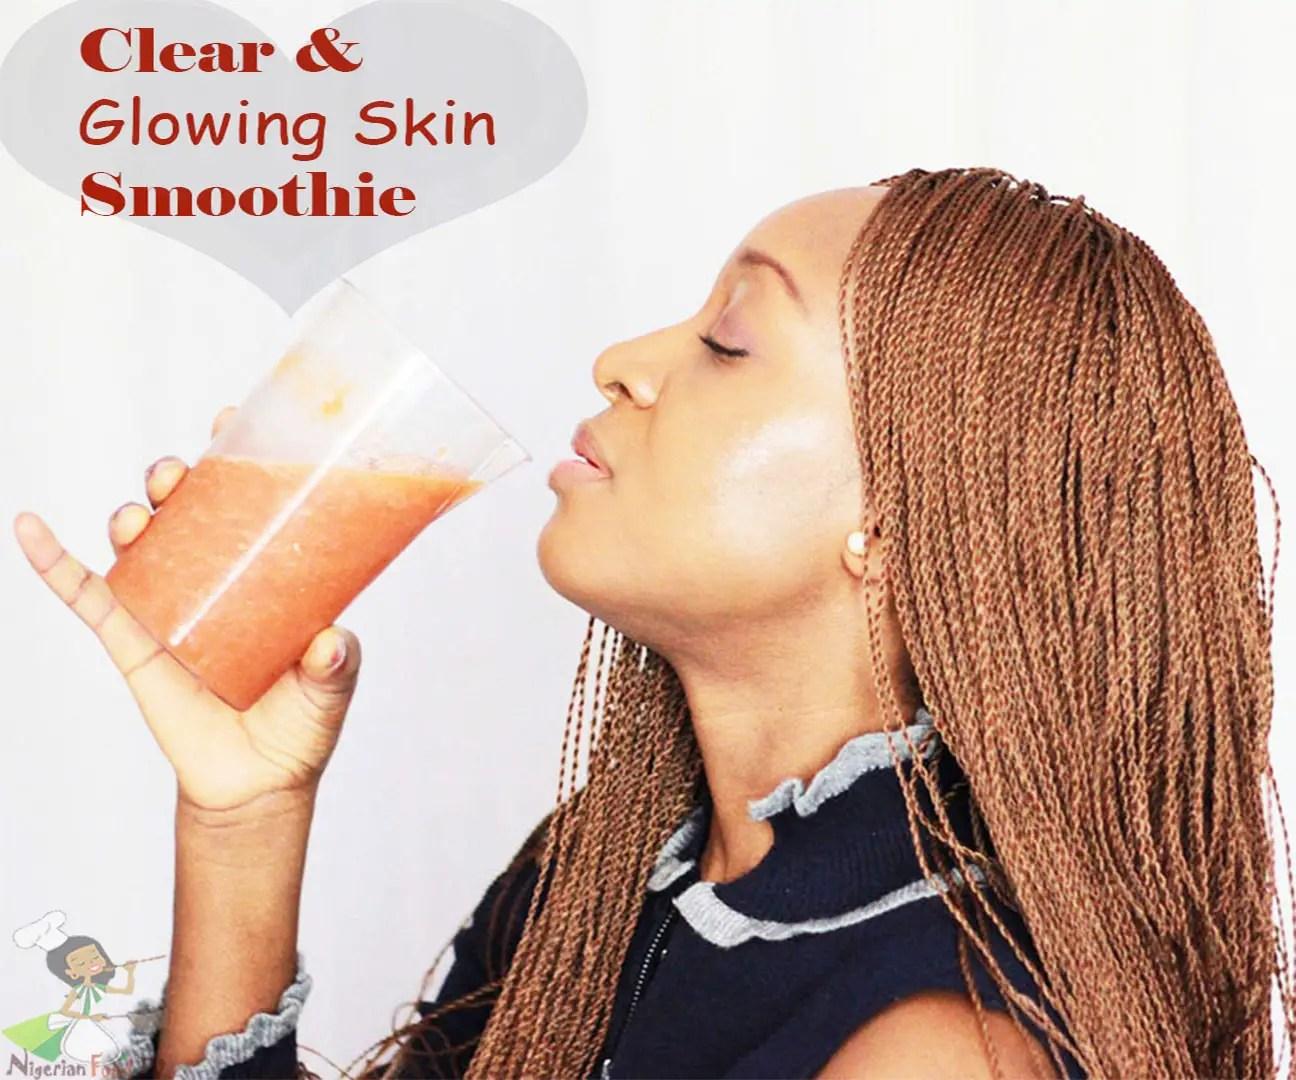 Skin Glowing Smoothie: Get Clear Skin in 5 days